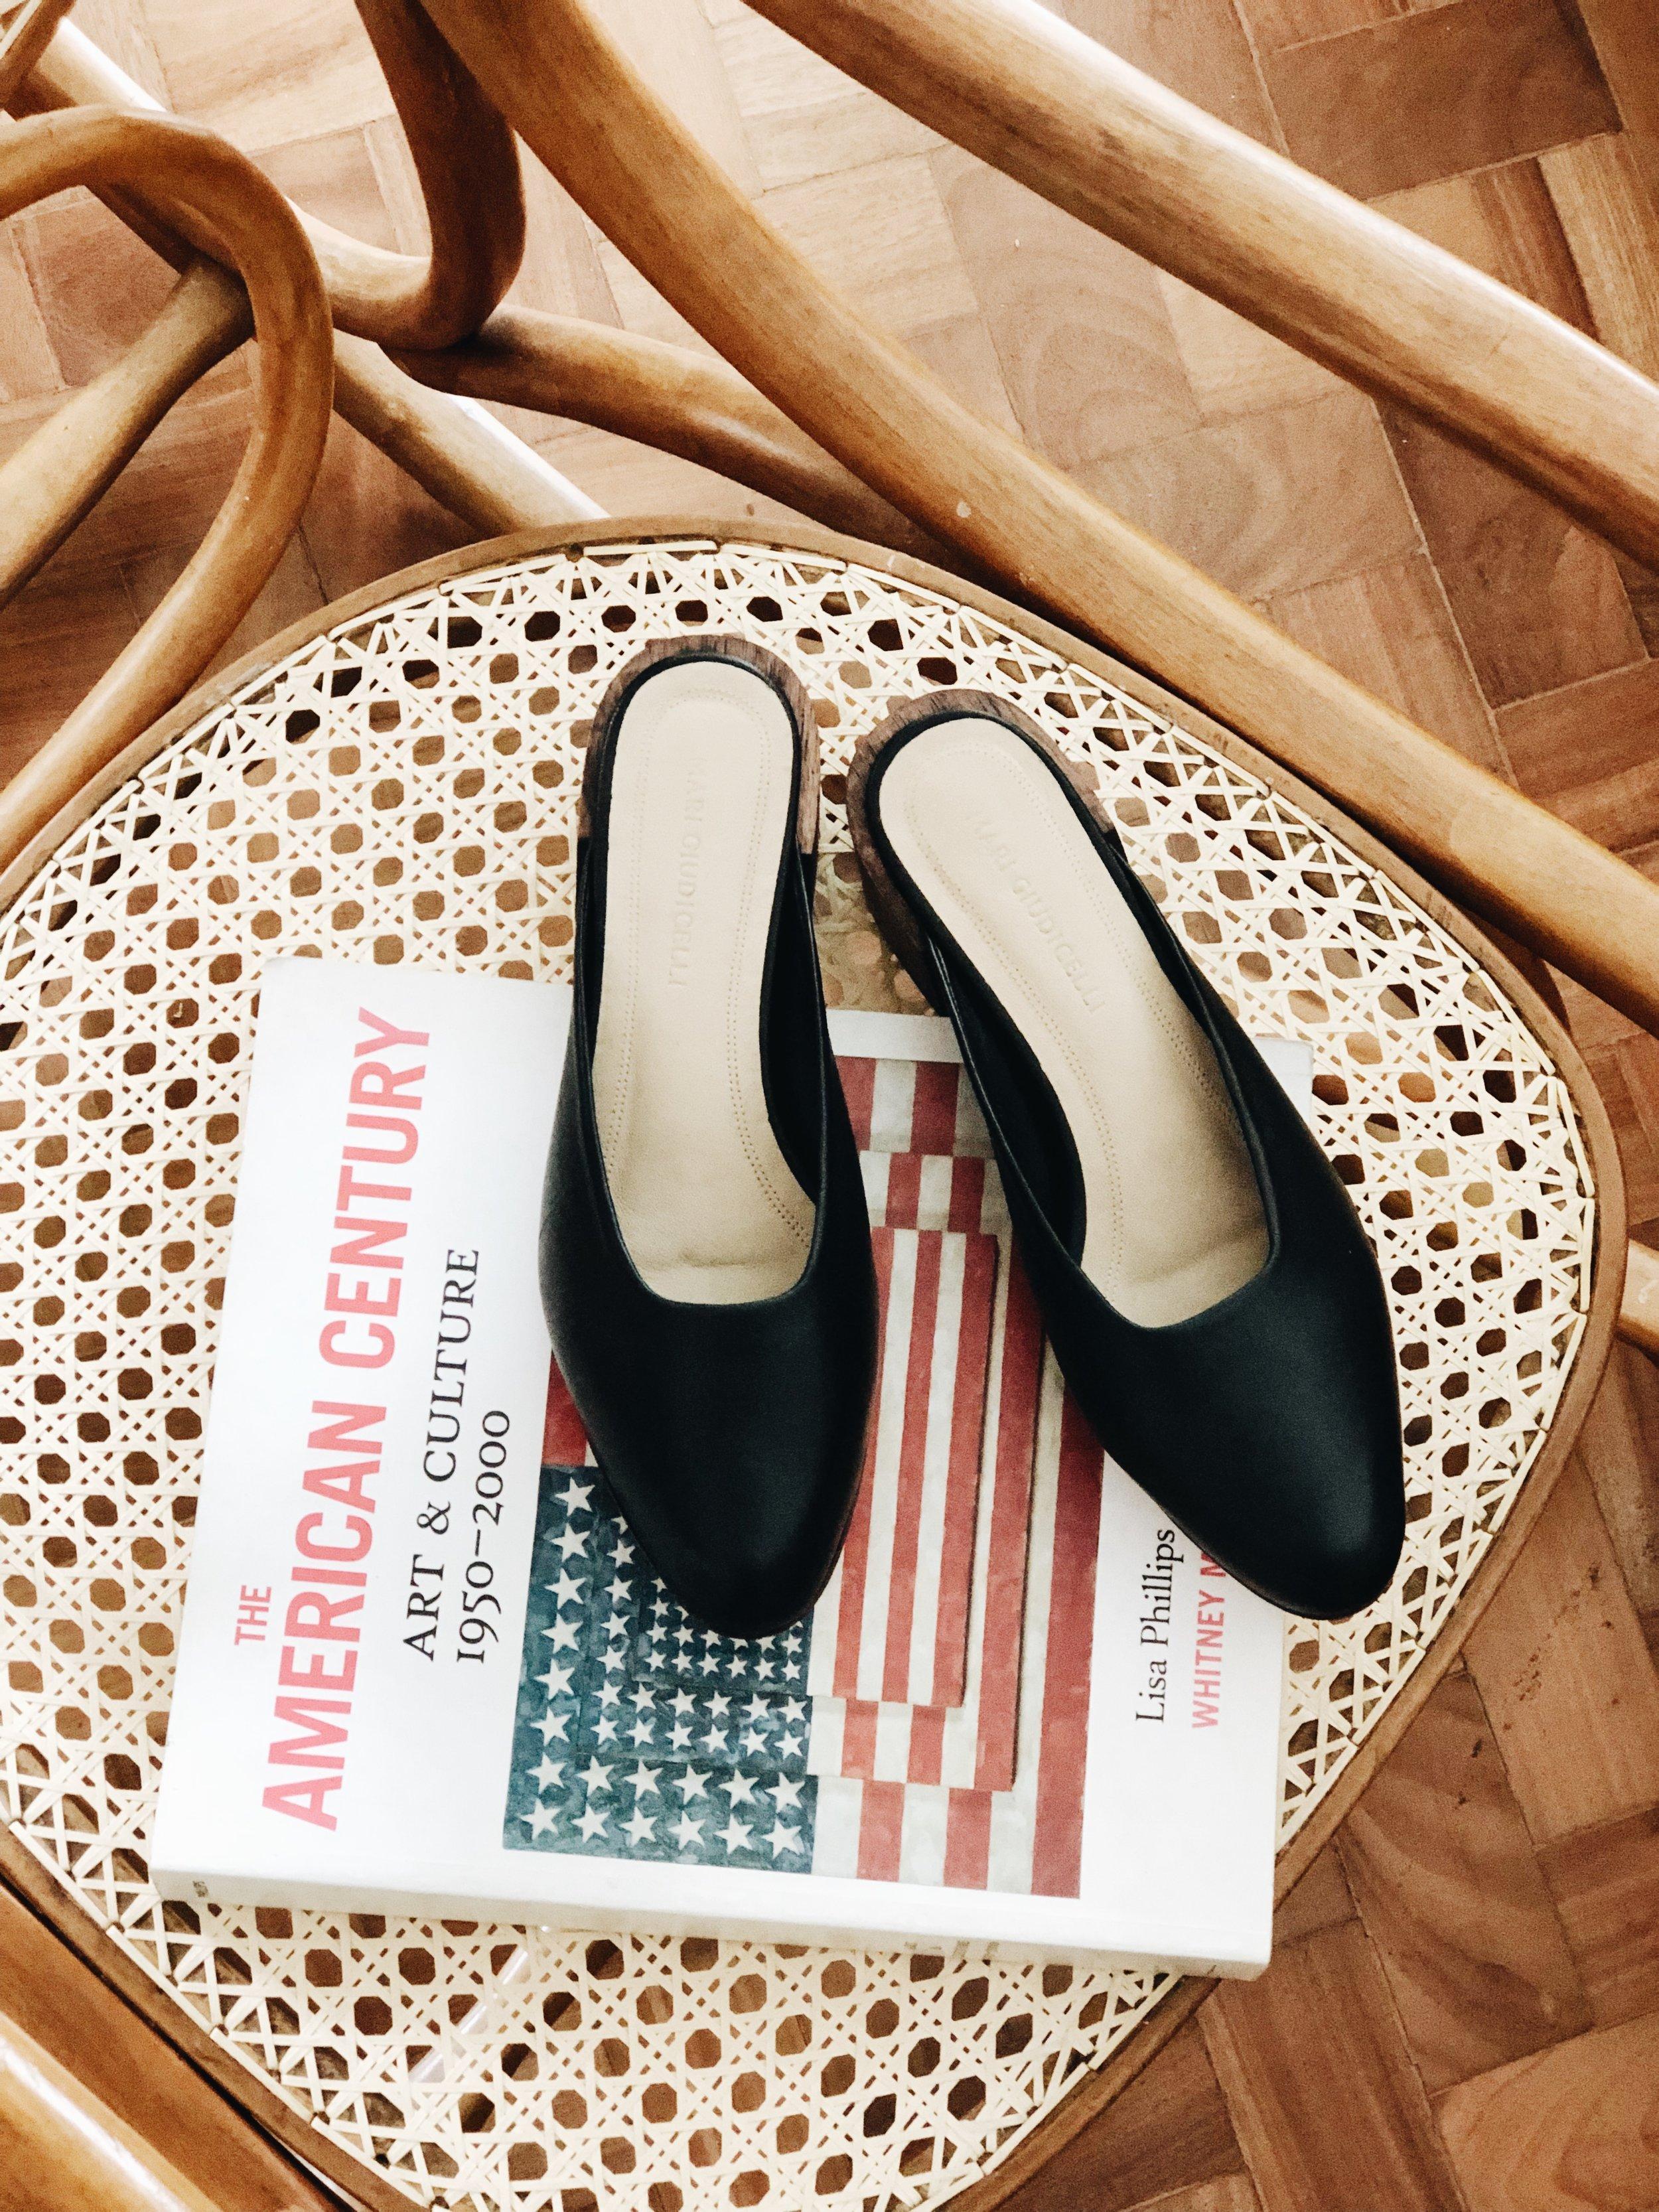 My brand new Mari Giudicelli shoes